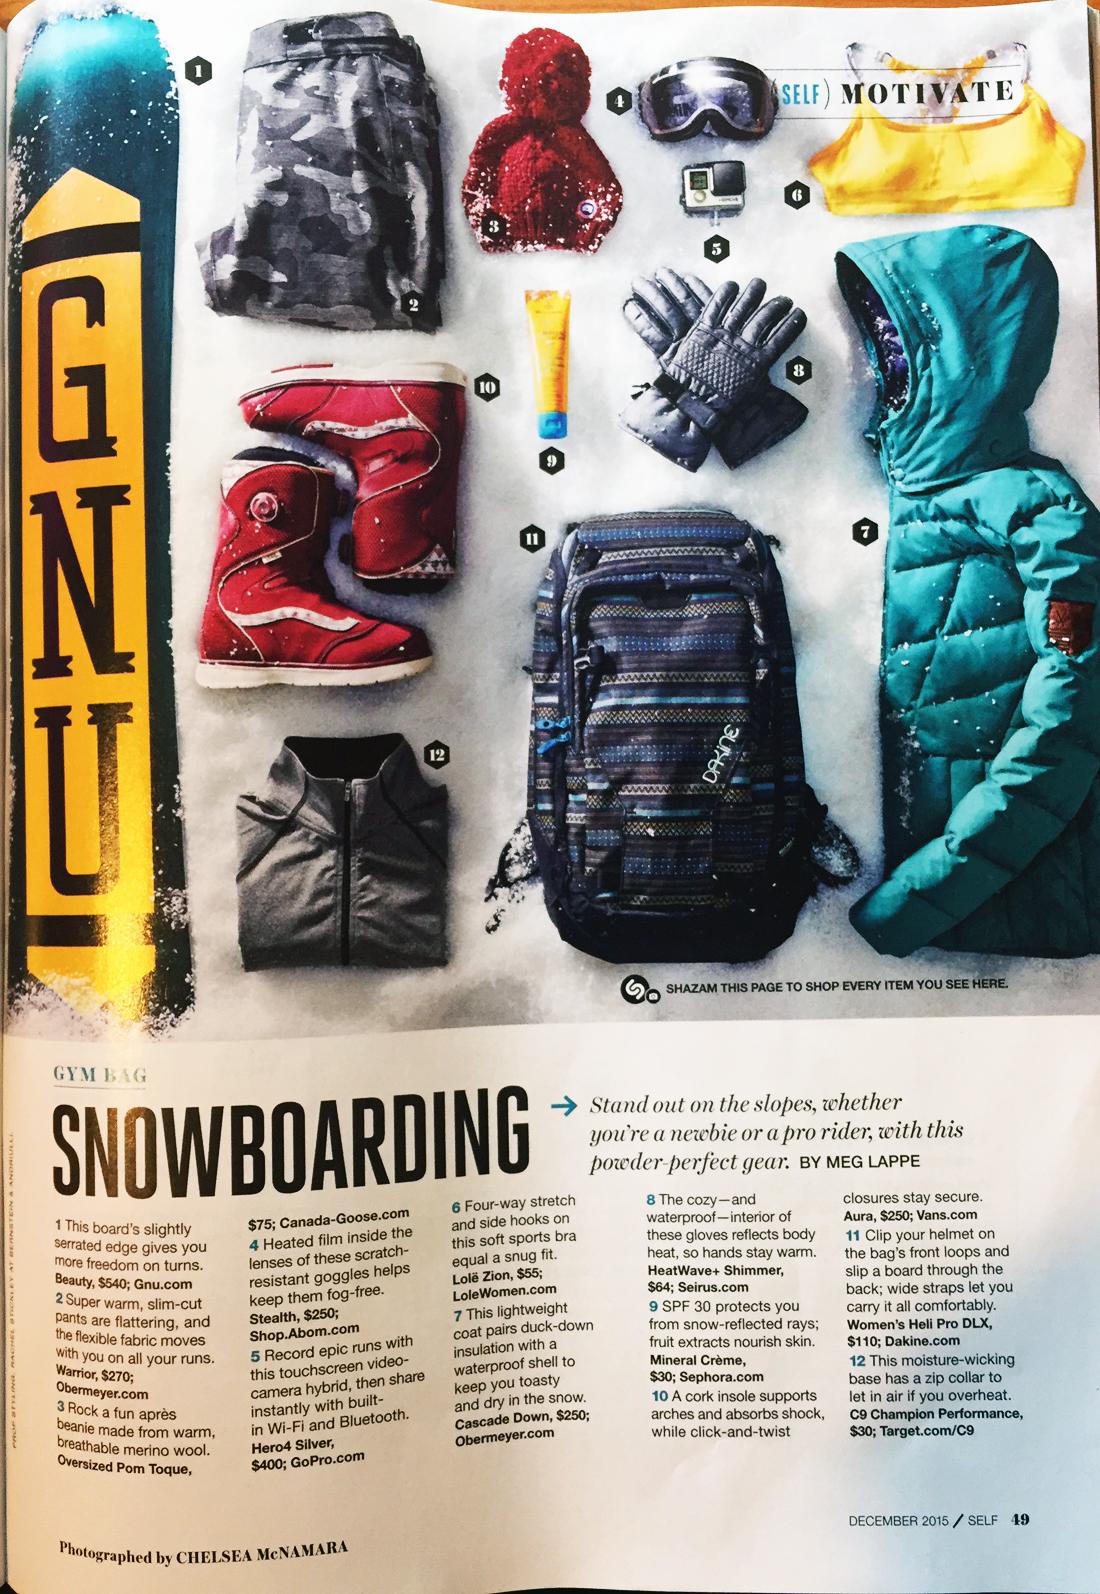 SELF magazine spread